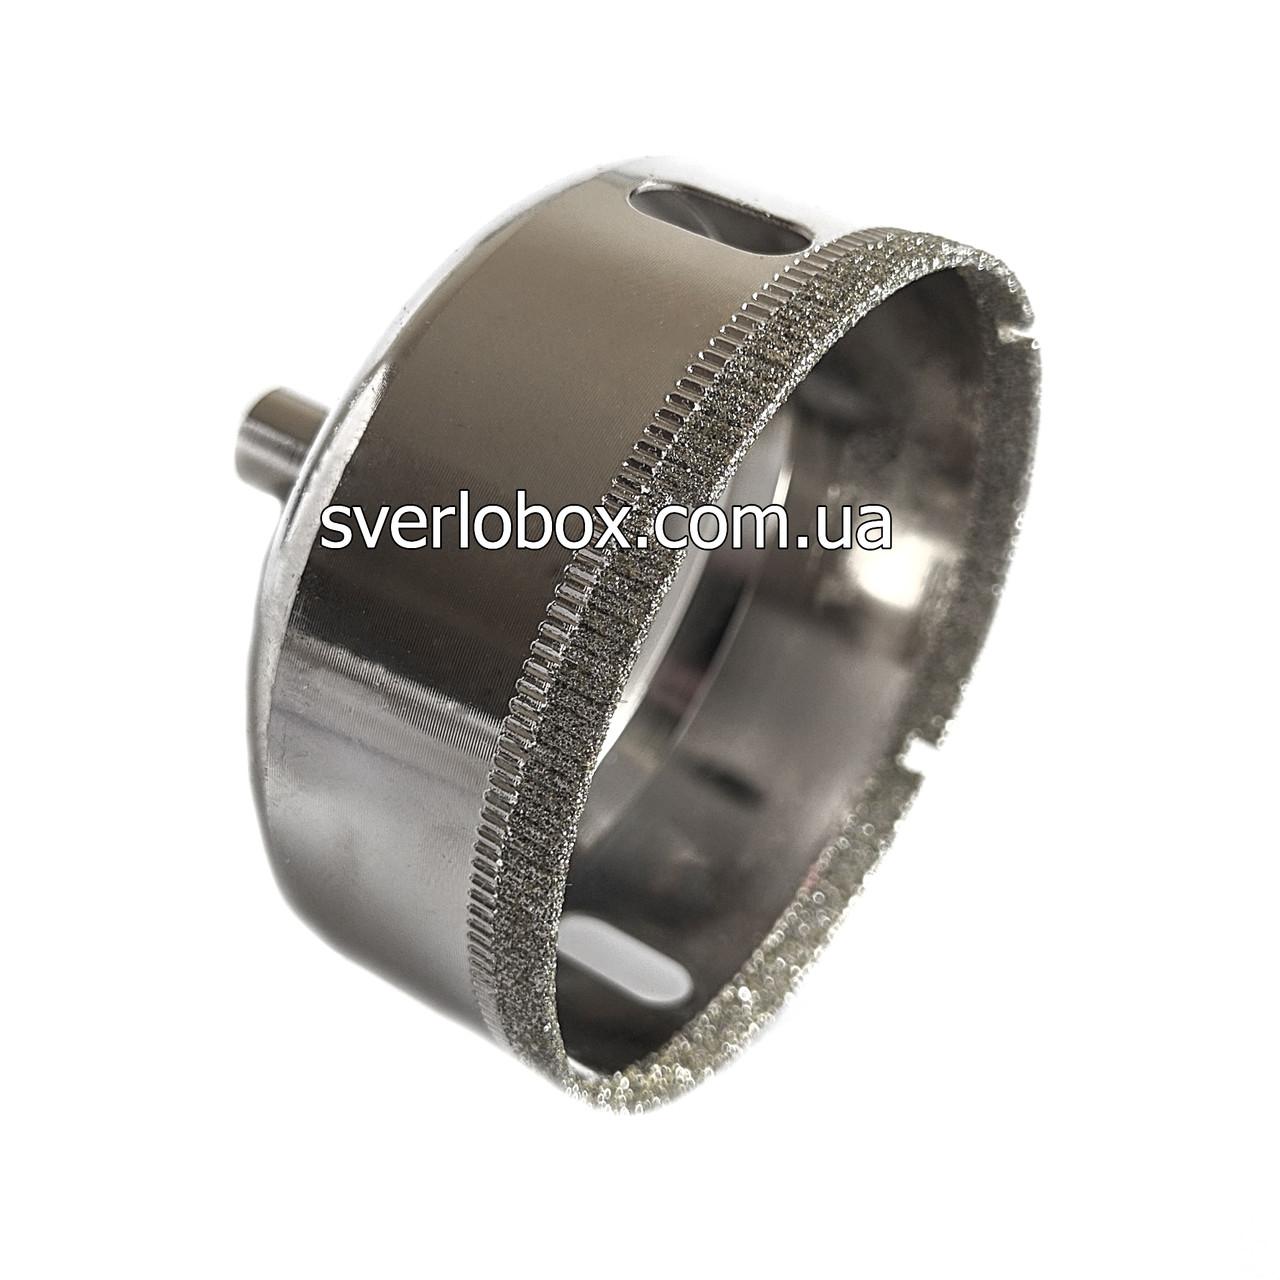 Коронка алмазная 30 мм